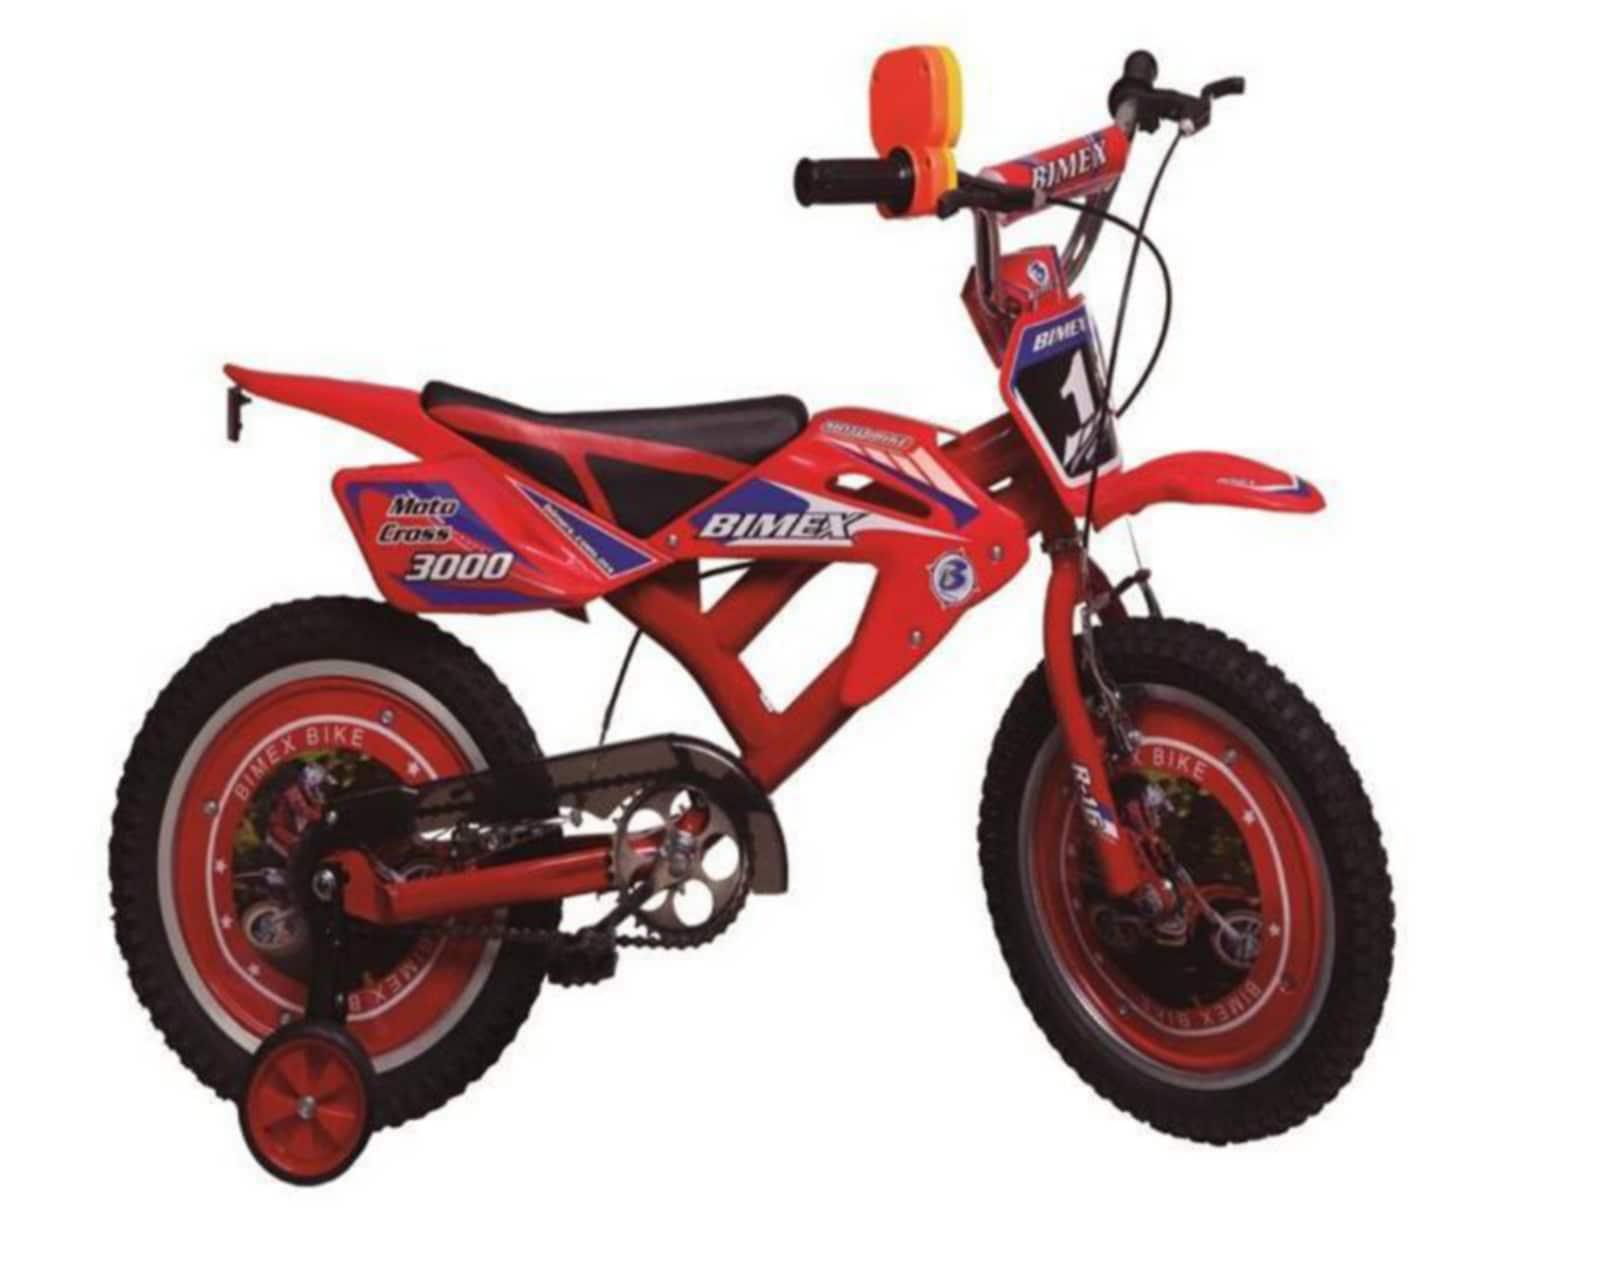 Bicicleta Bimex Motocross 1600 16